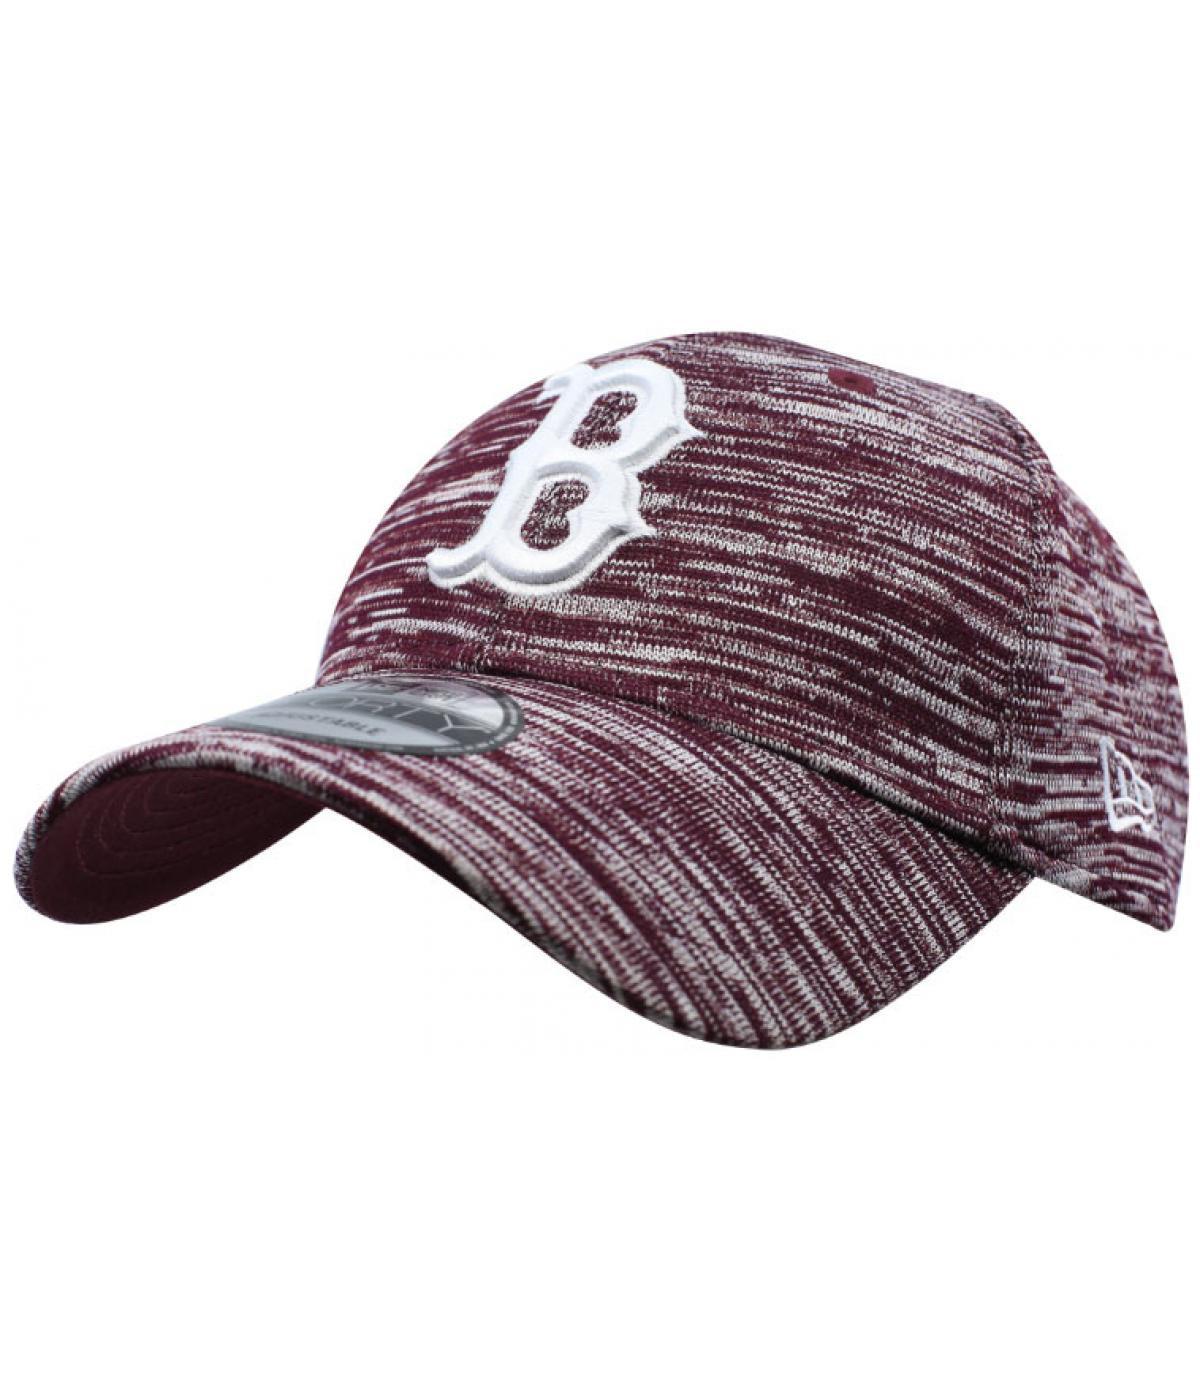 Engineered B bordeaux cap